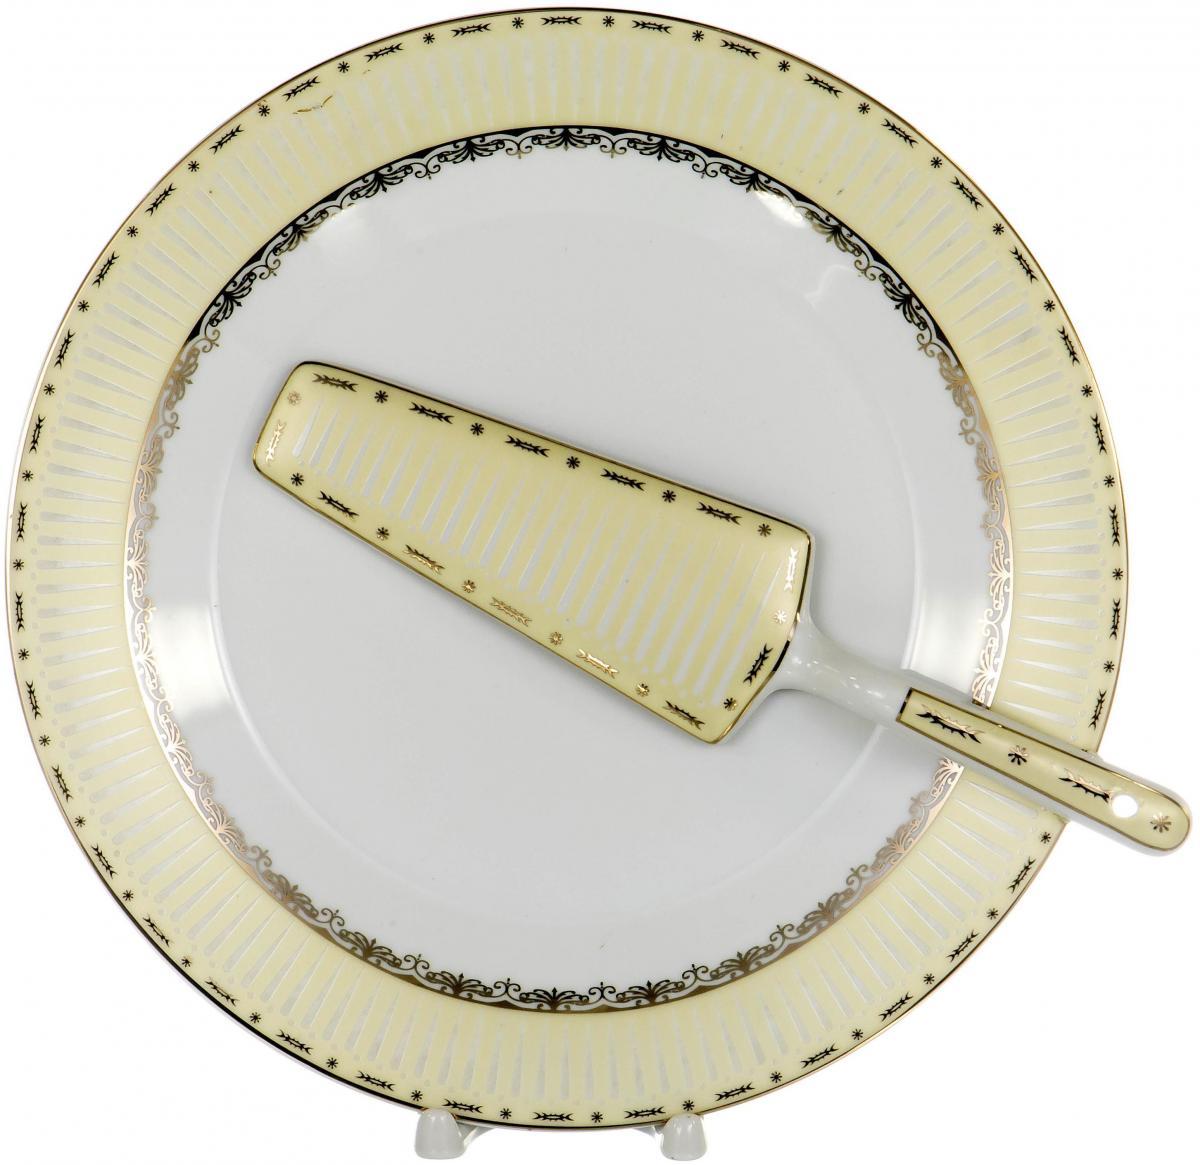 Набор для торта Olaff, 2 предмета. LRG-CPN2-003LRG-CPN2-003CAKE 2, набор д/торта (2) блюдо 255мм + лопатка, декор - золото-серебро, подарочная упаковка